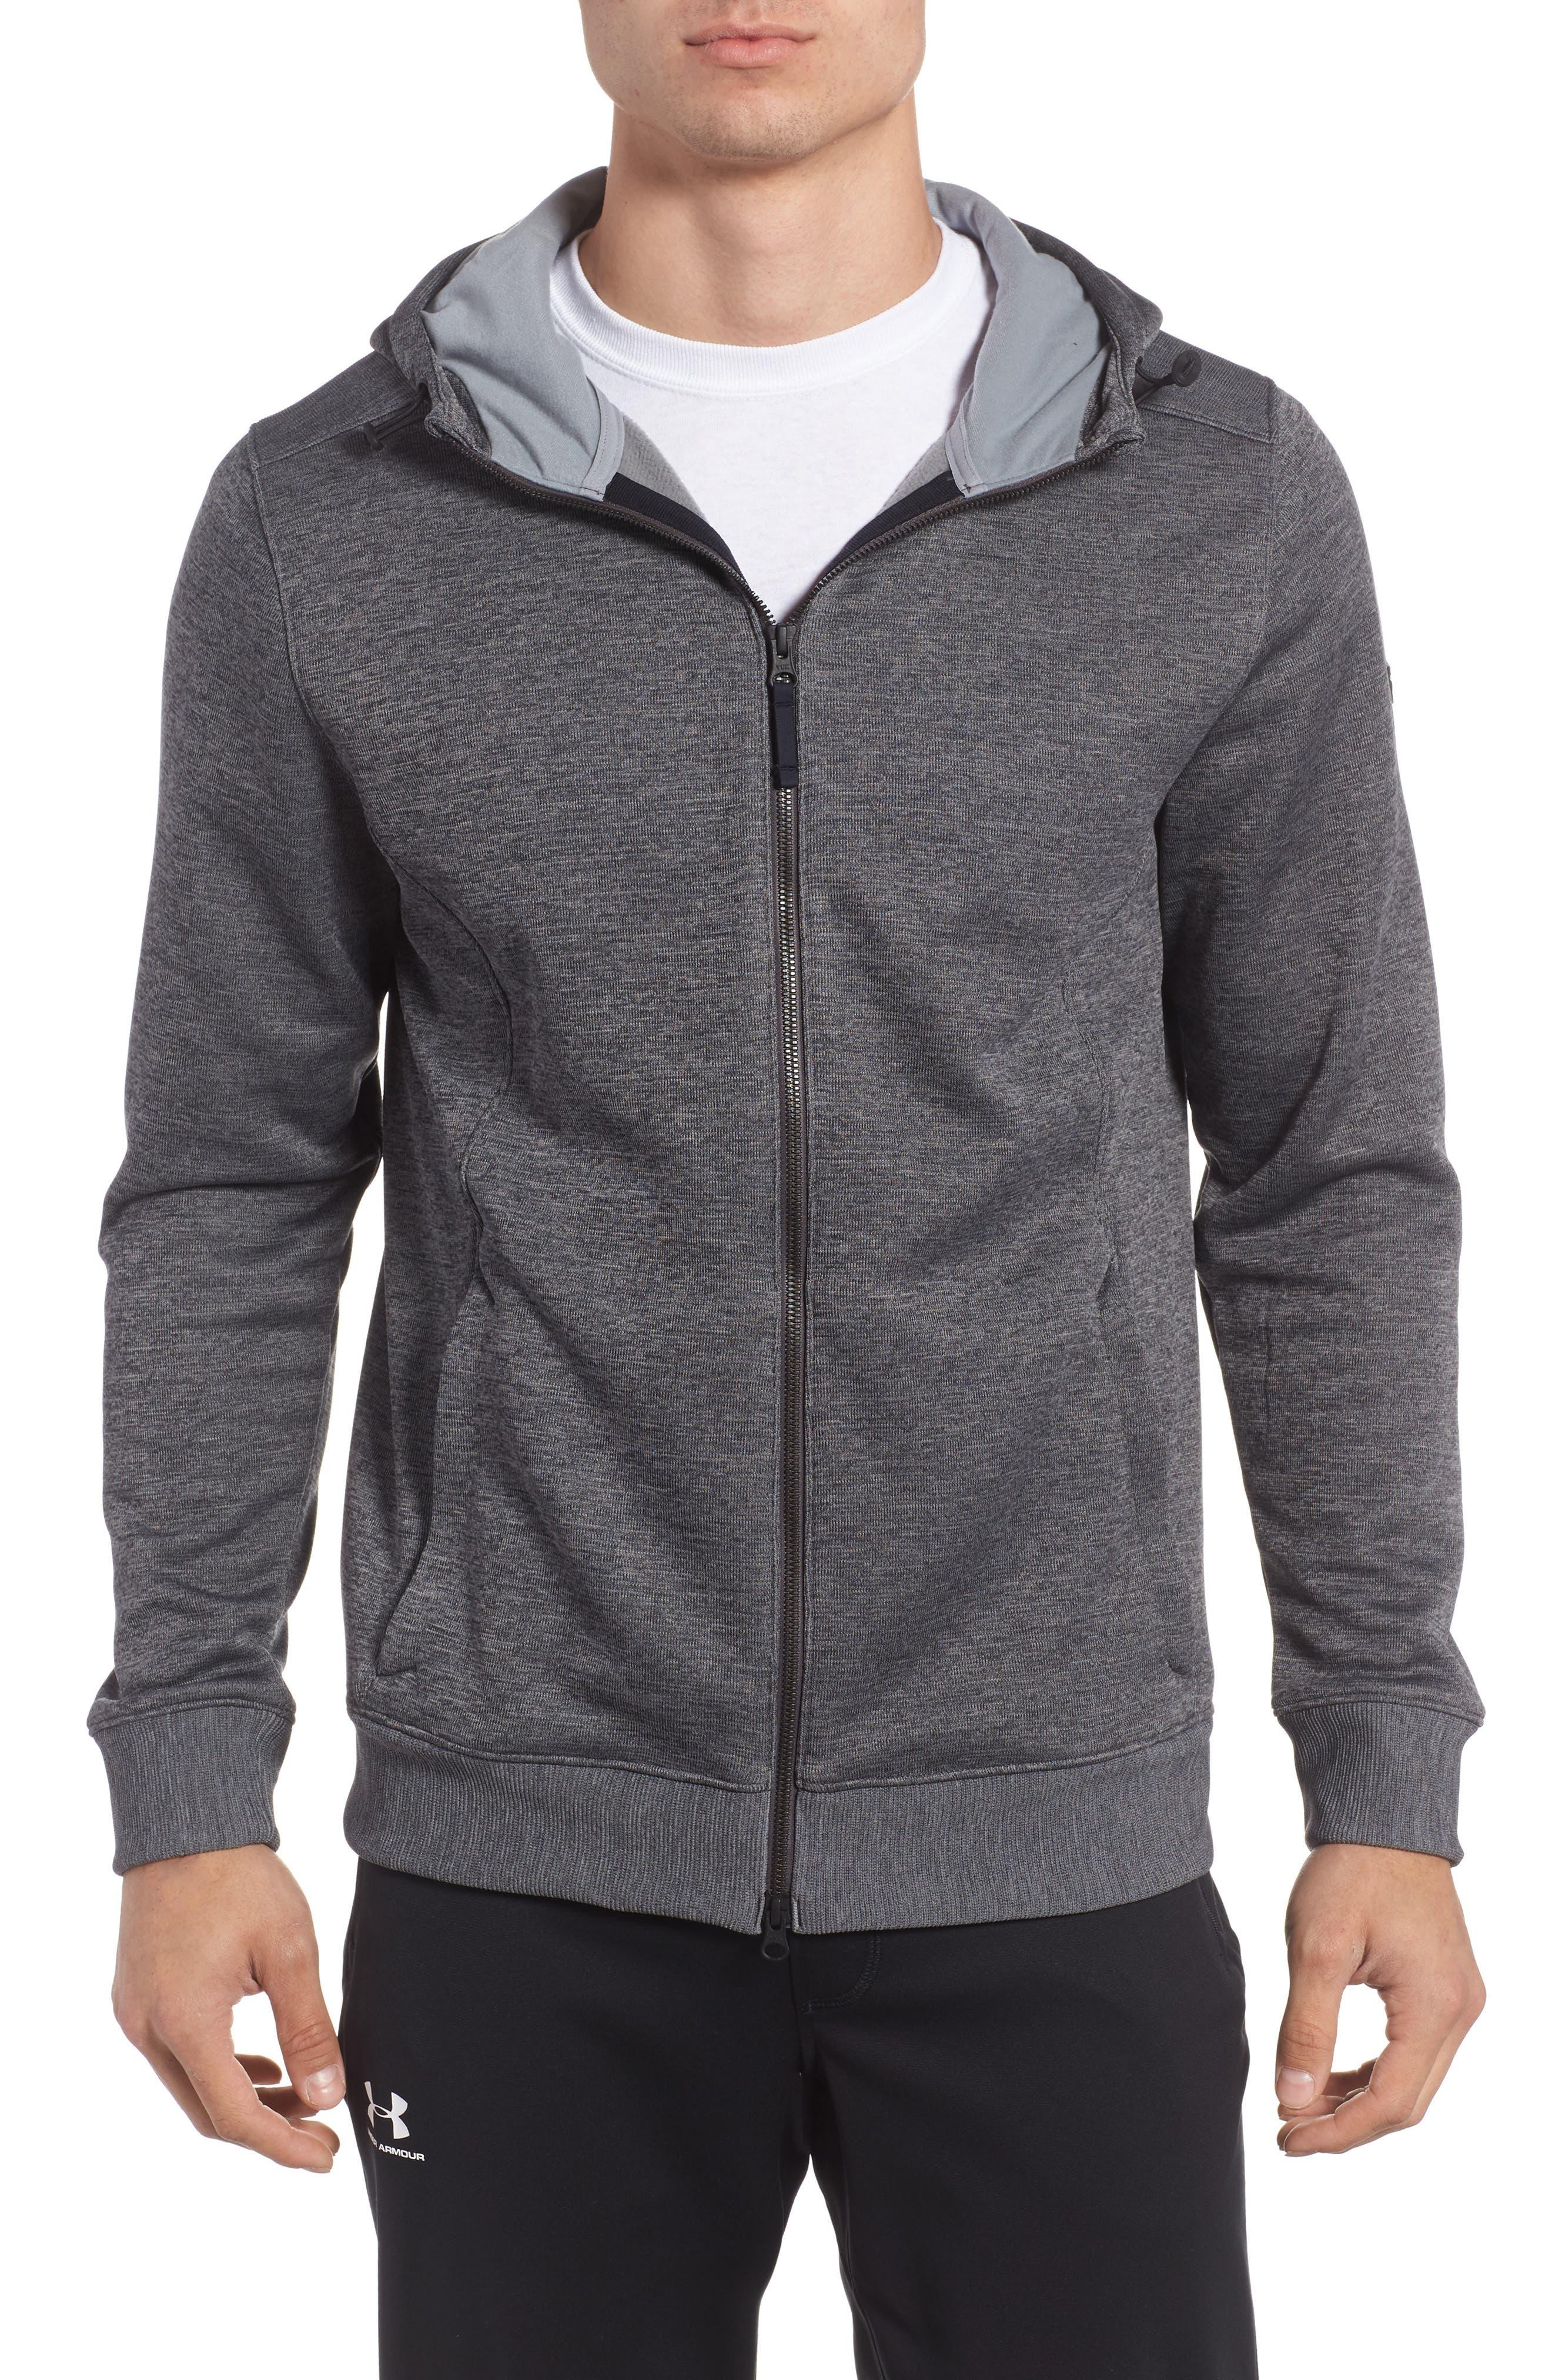 Sportstyle Zip Hoodie,                         Main,                         color, Carbon Heather / Steel